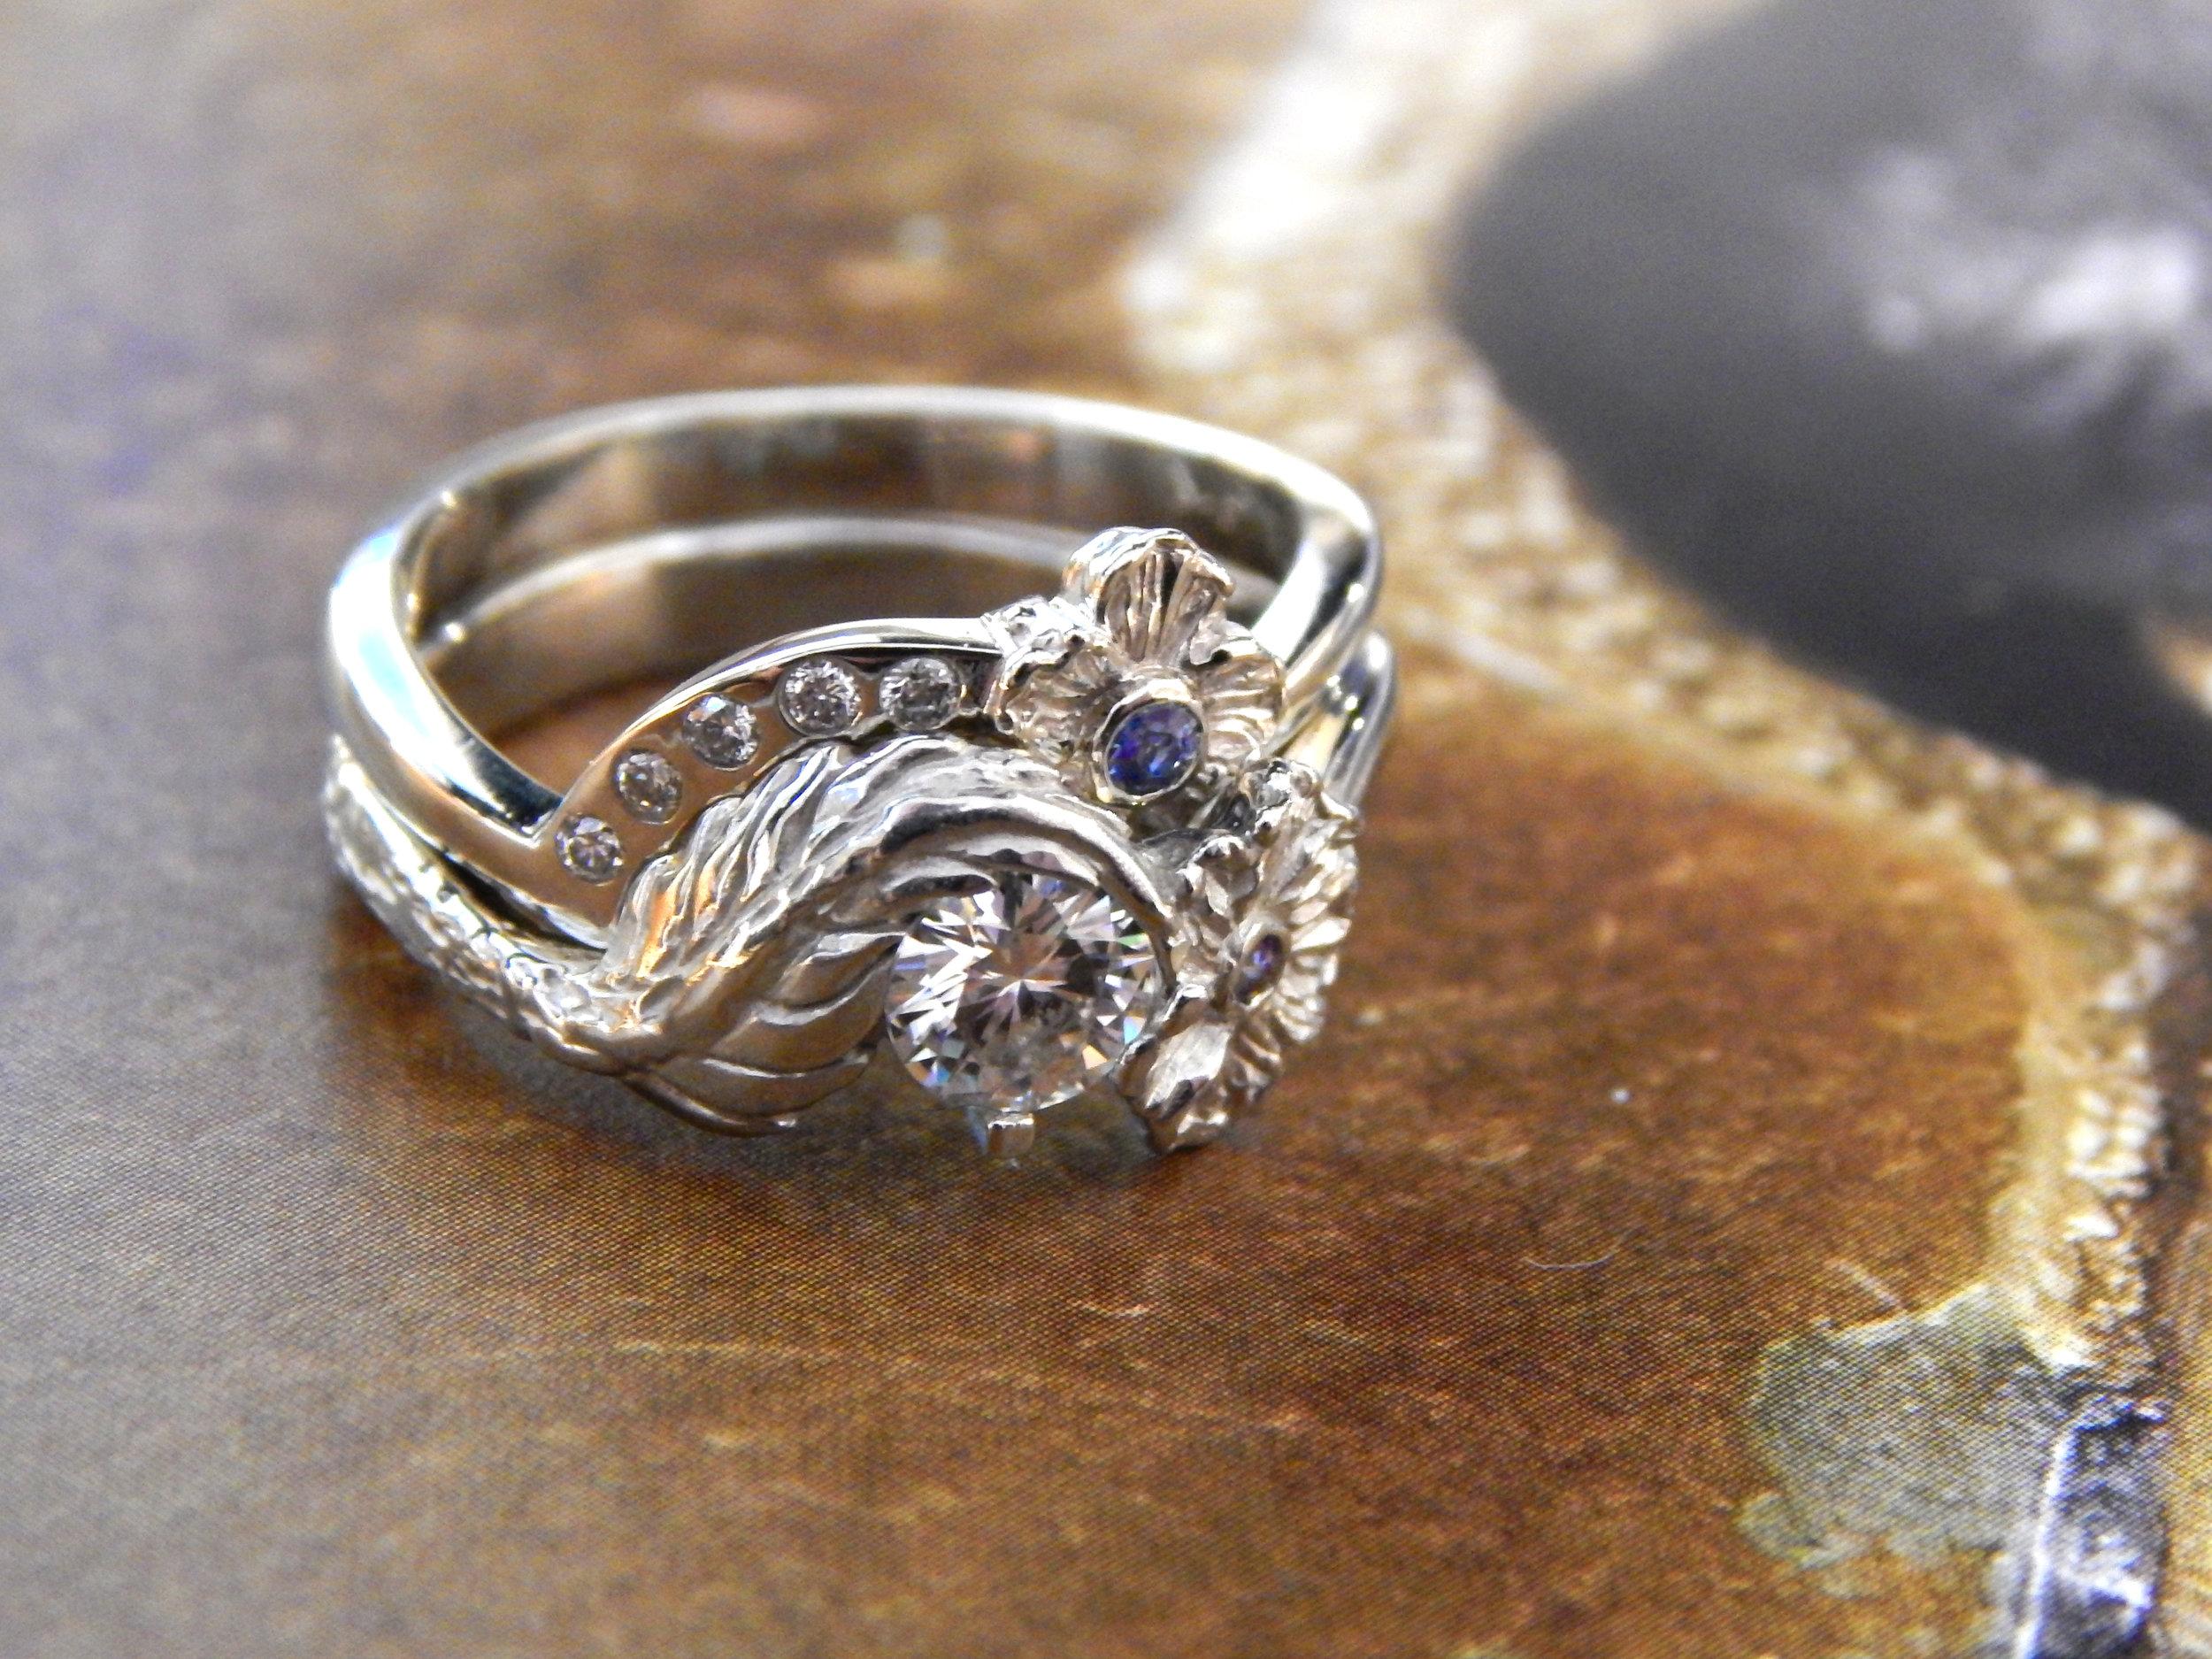 darvier-hand-carved-diamond-sapphire-wedding-set-organic.JPG